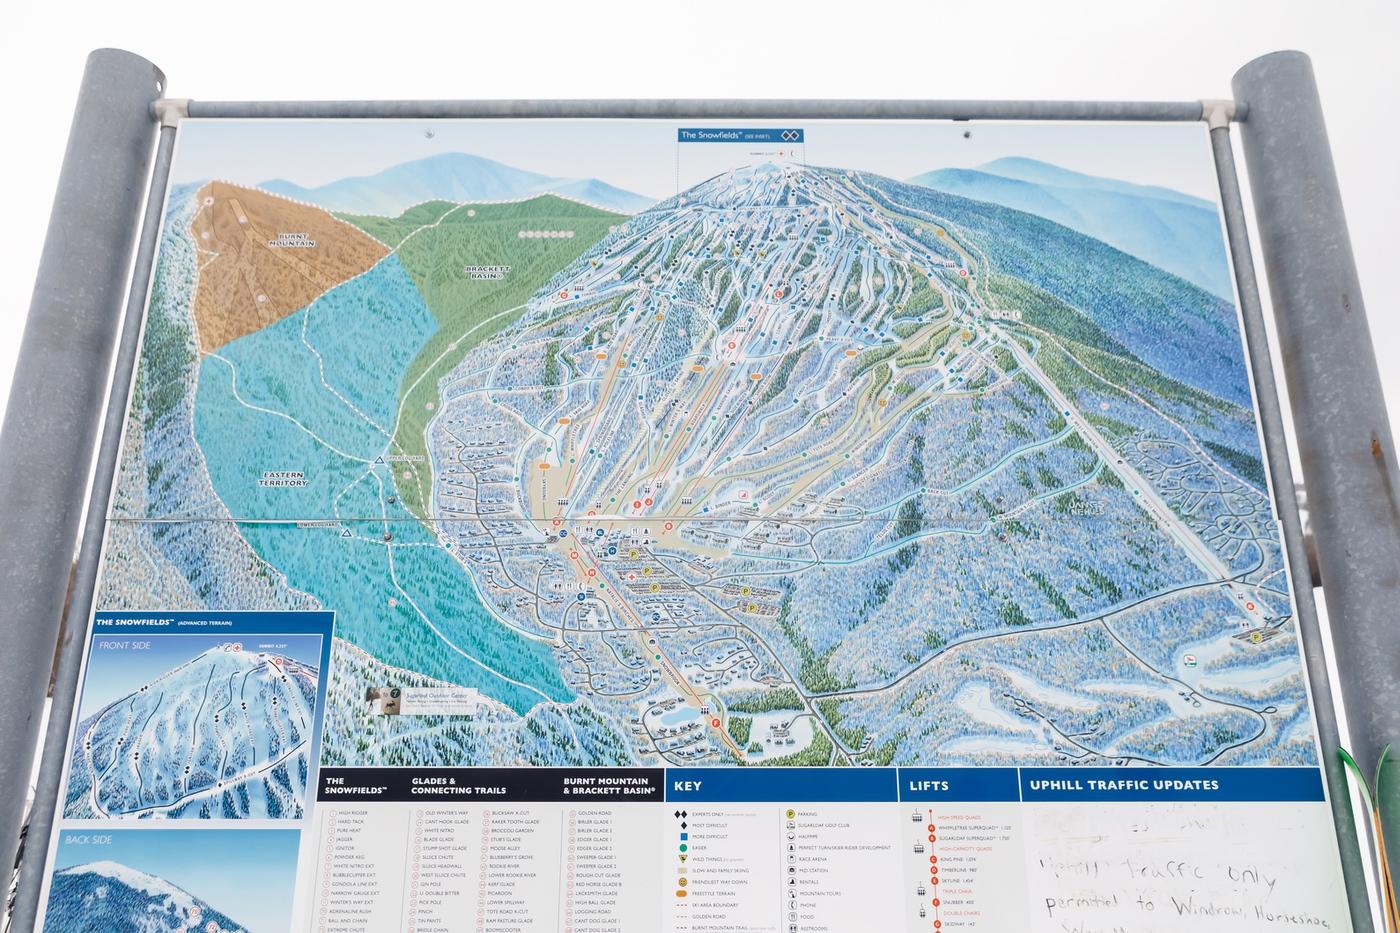 WinterKids Downhill 24 2021 SDP 2561